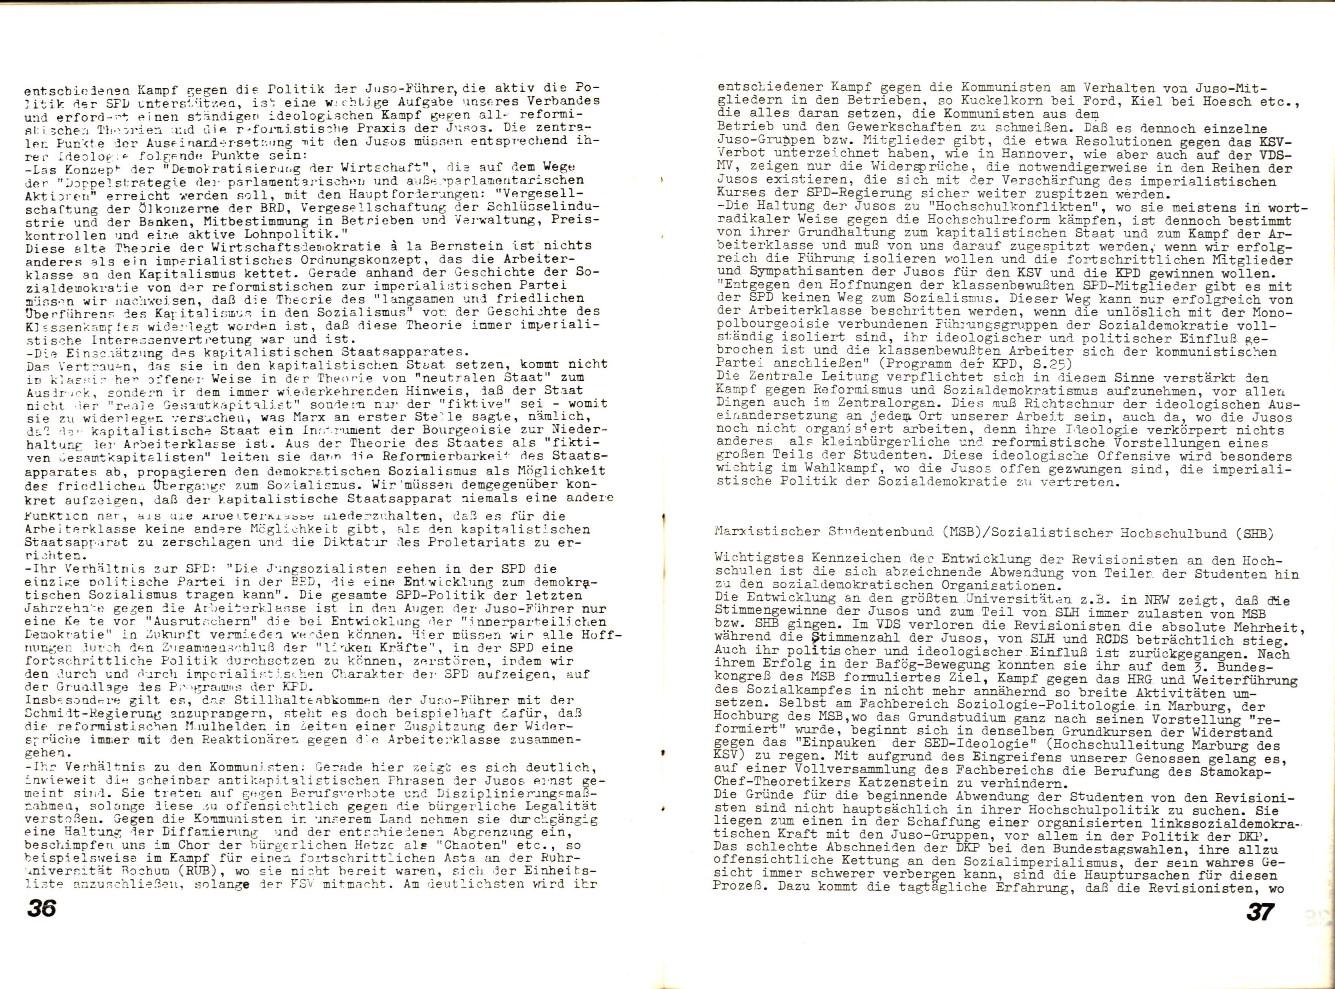 KSV_1974_Rechenschaftsbericht_20